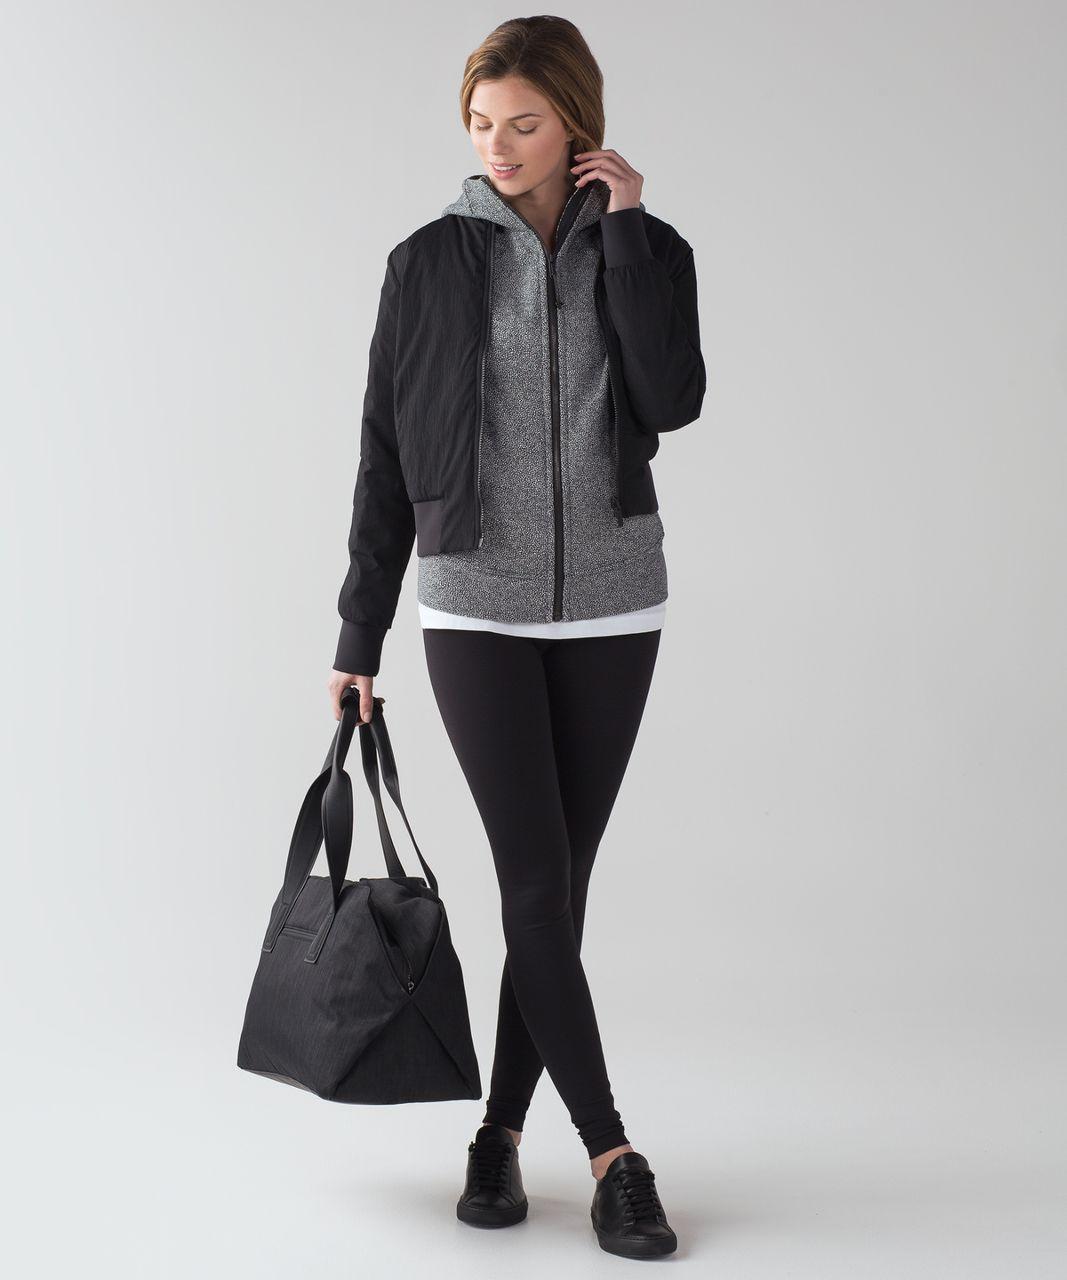 Lululemon Scuba Hoodie IV - Chakra Print Alpine White Black